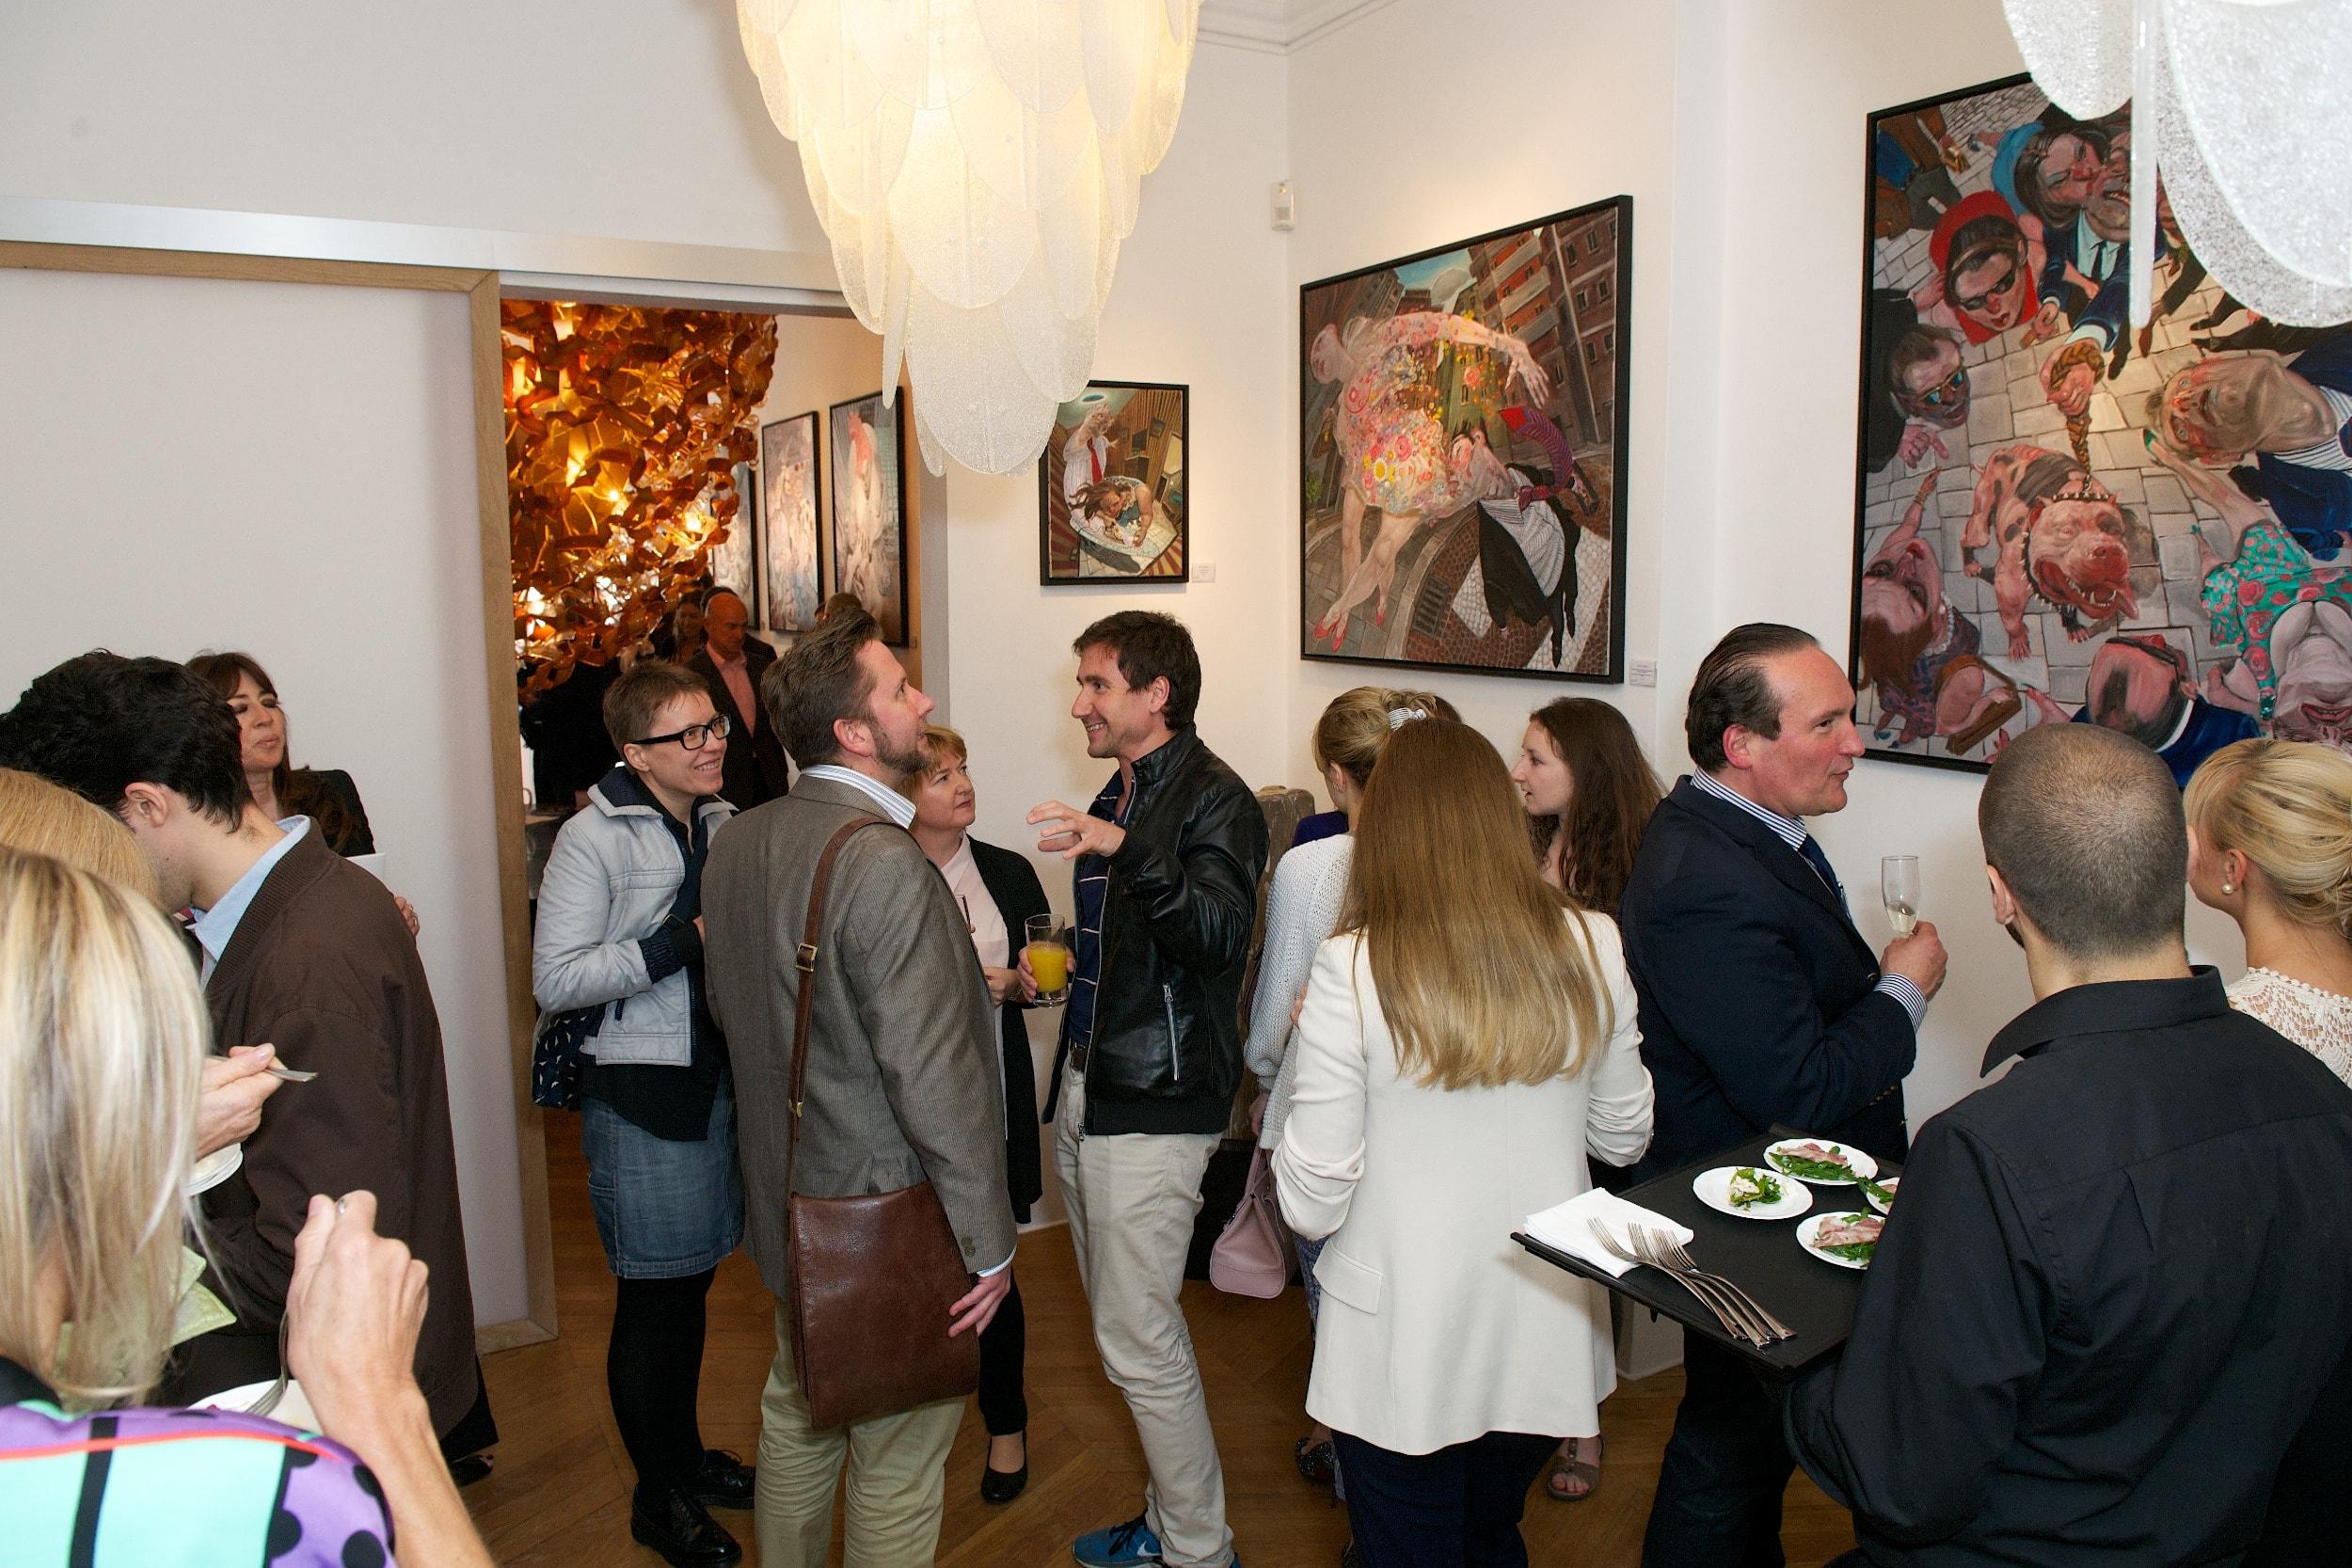 3-exhibition-photo-enrico-robusti-ransom-art-gallery-min.jpg